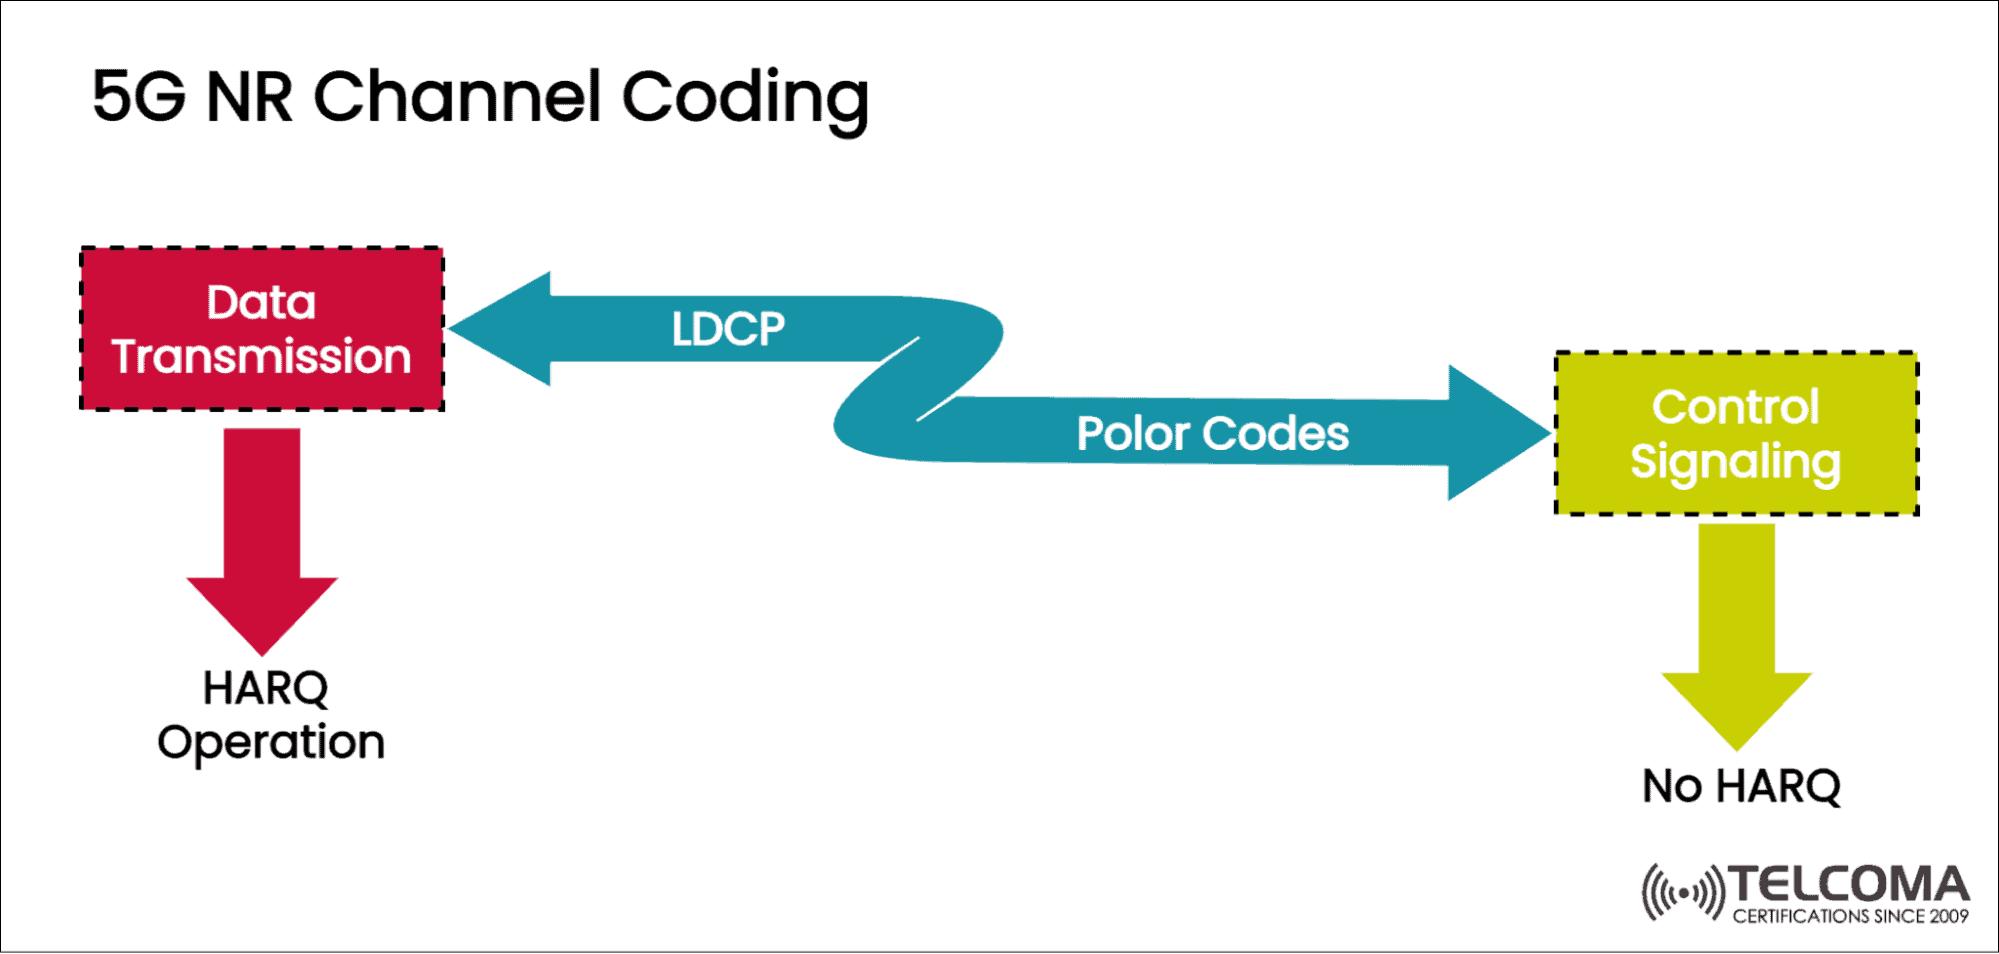 5g nr channel coding